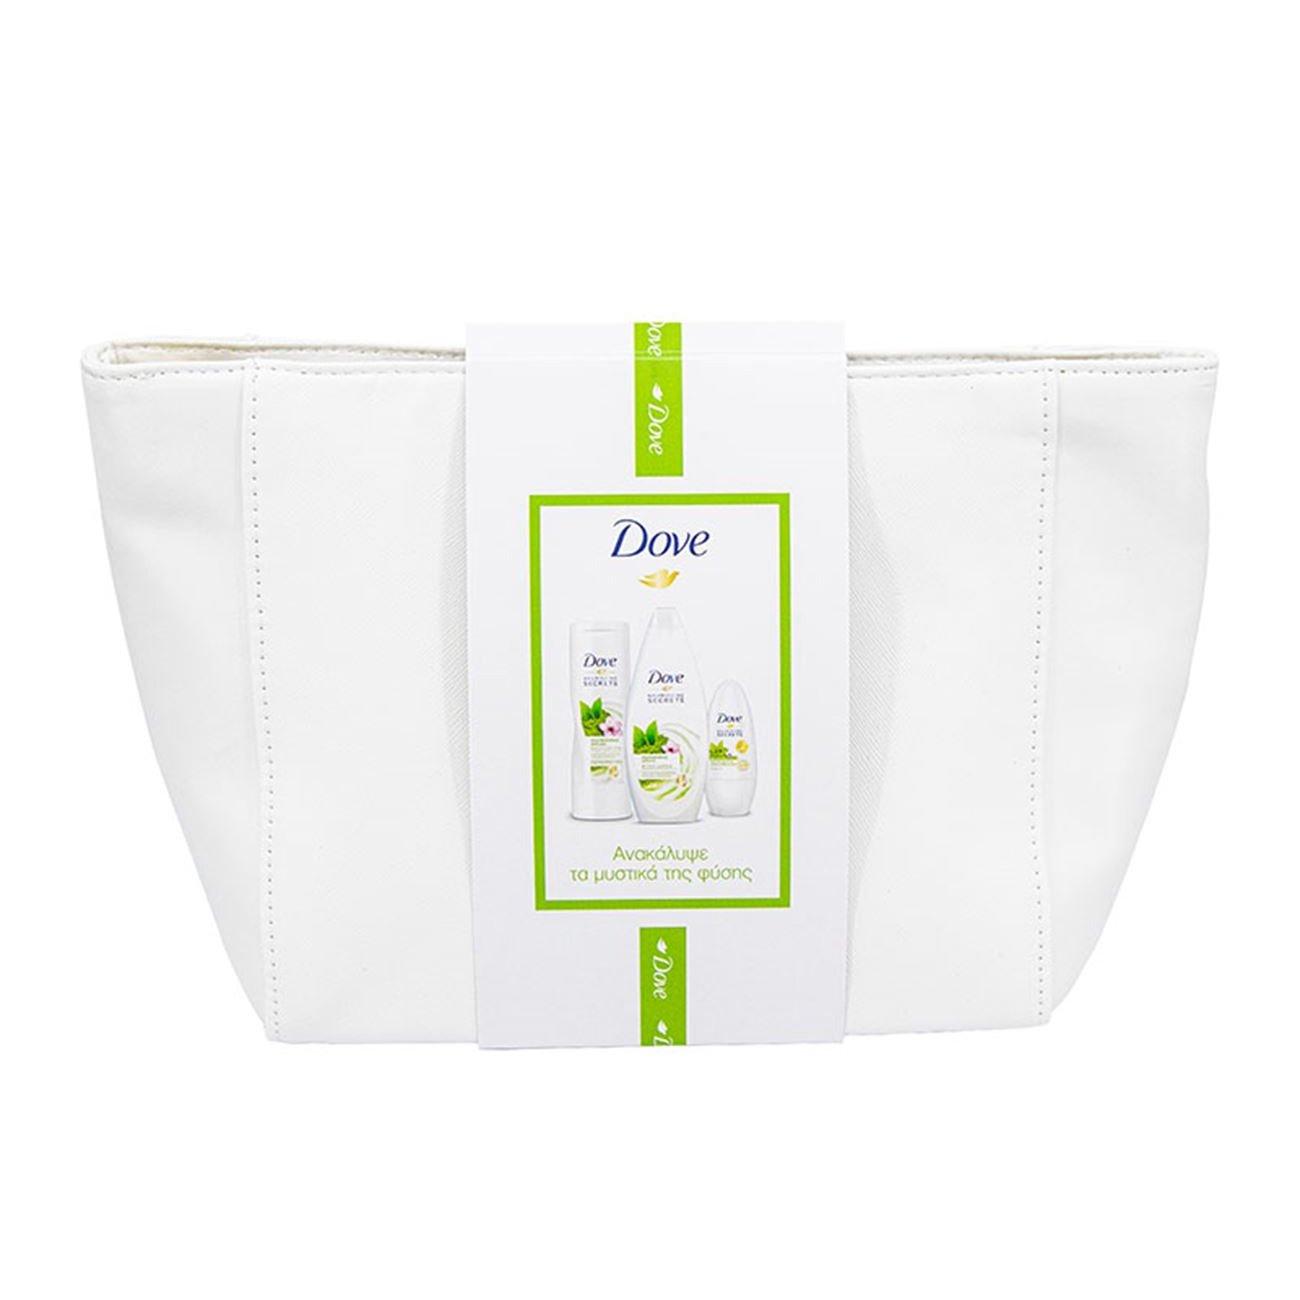 Dove Promo Nourishing Secrets Matcha Body Wash 250ml,Body Lotion 250ml,Anti-Transpirant 50ml Σειρά Περιποίησης Σώματος & Νεσεσέρ